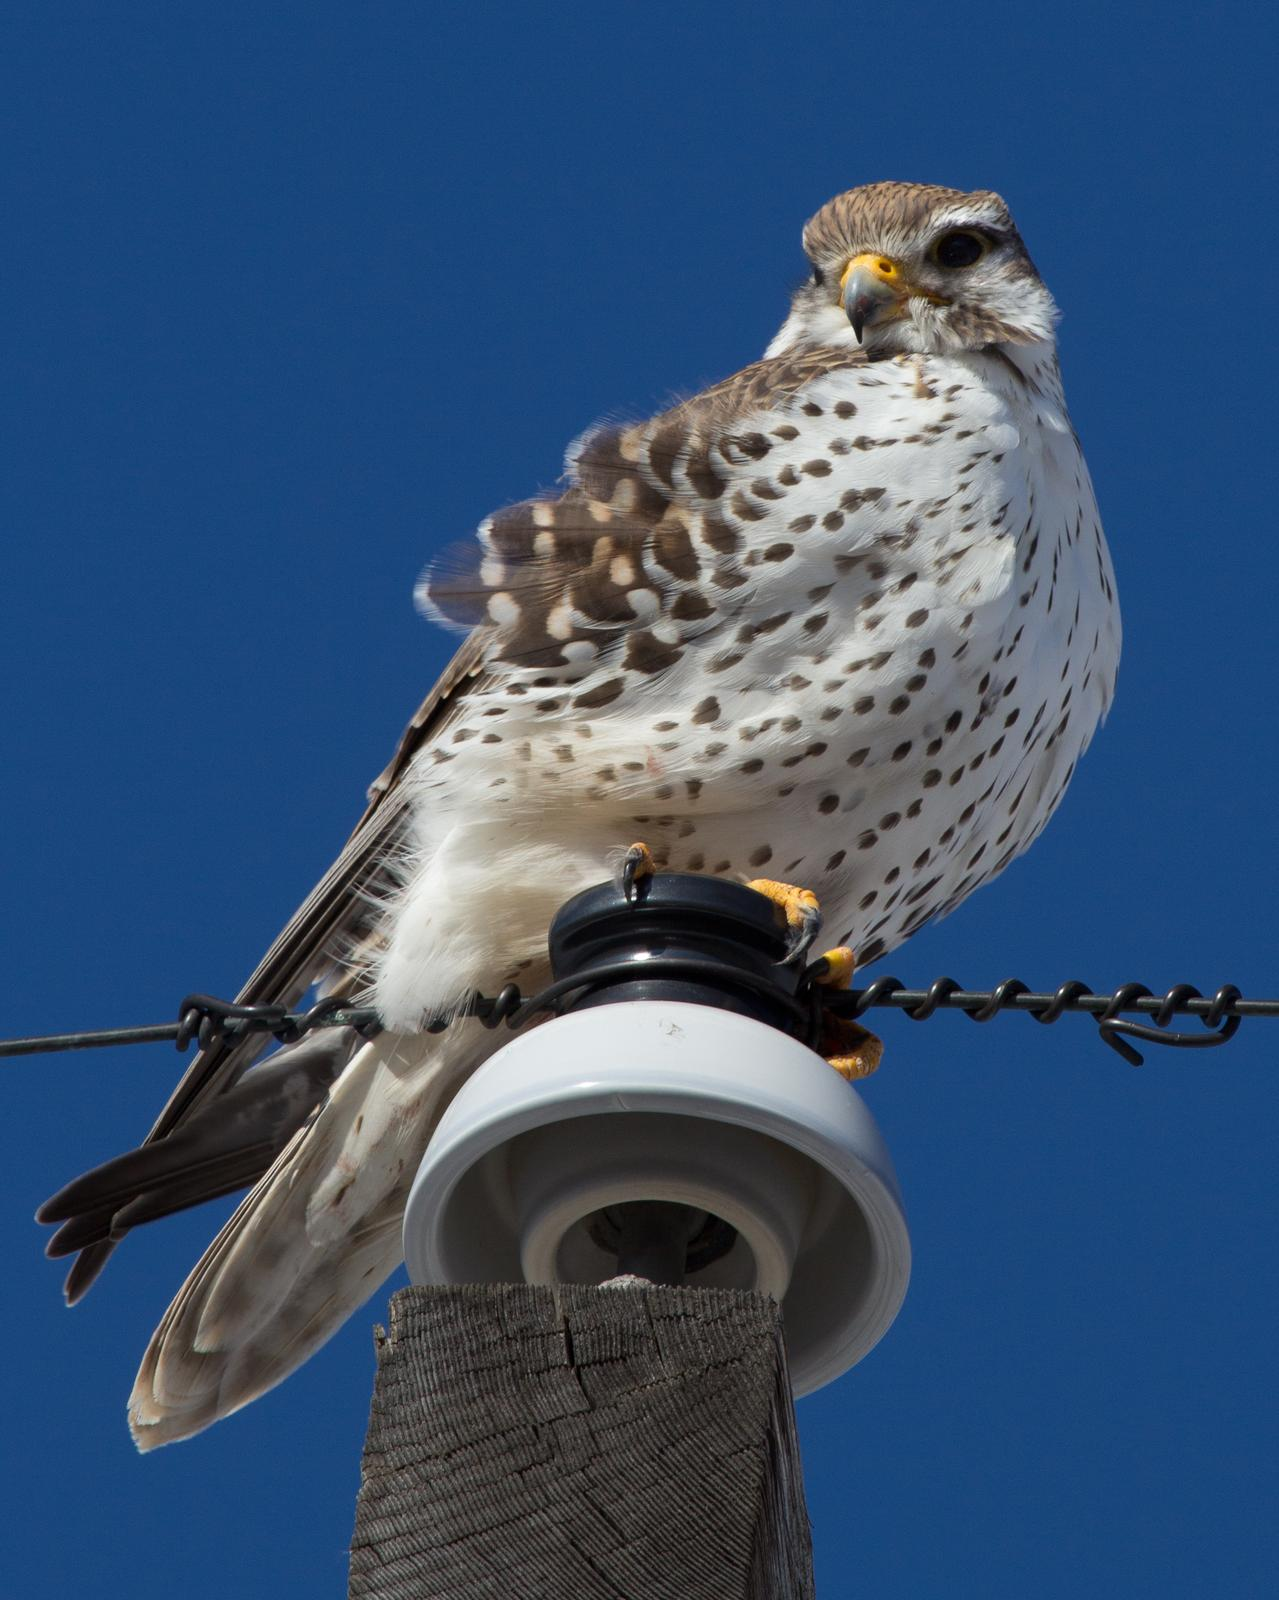 Prairie Falcon Photo by Anita Strawn de Ojeda